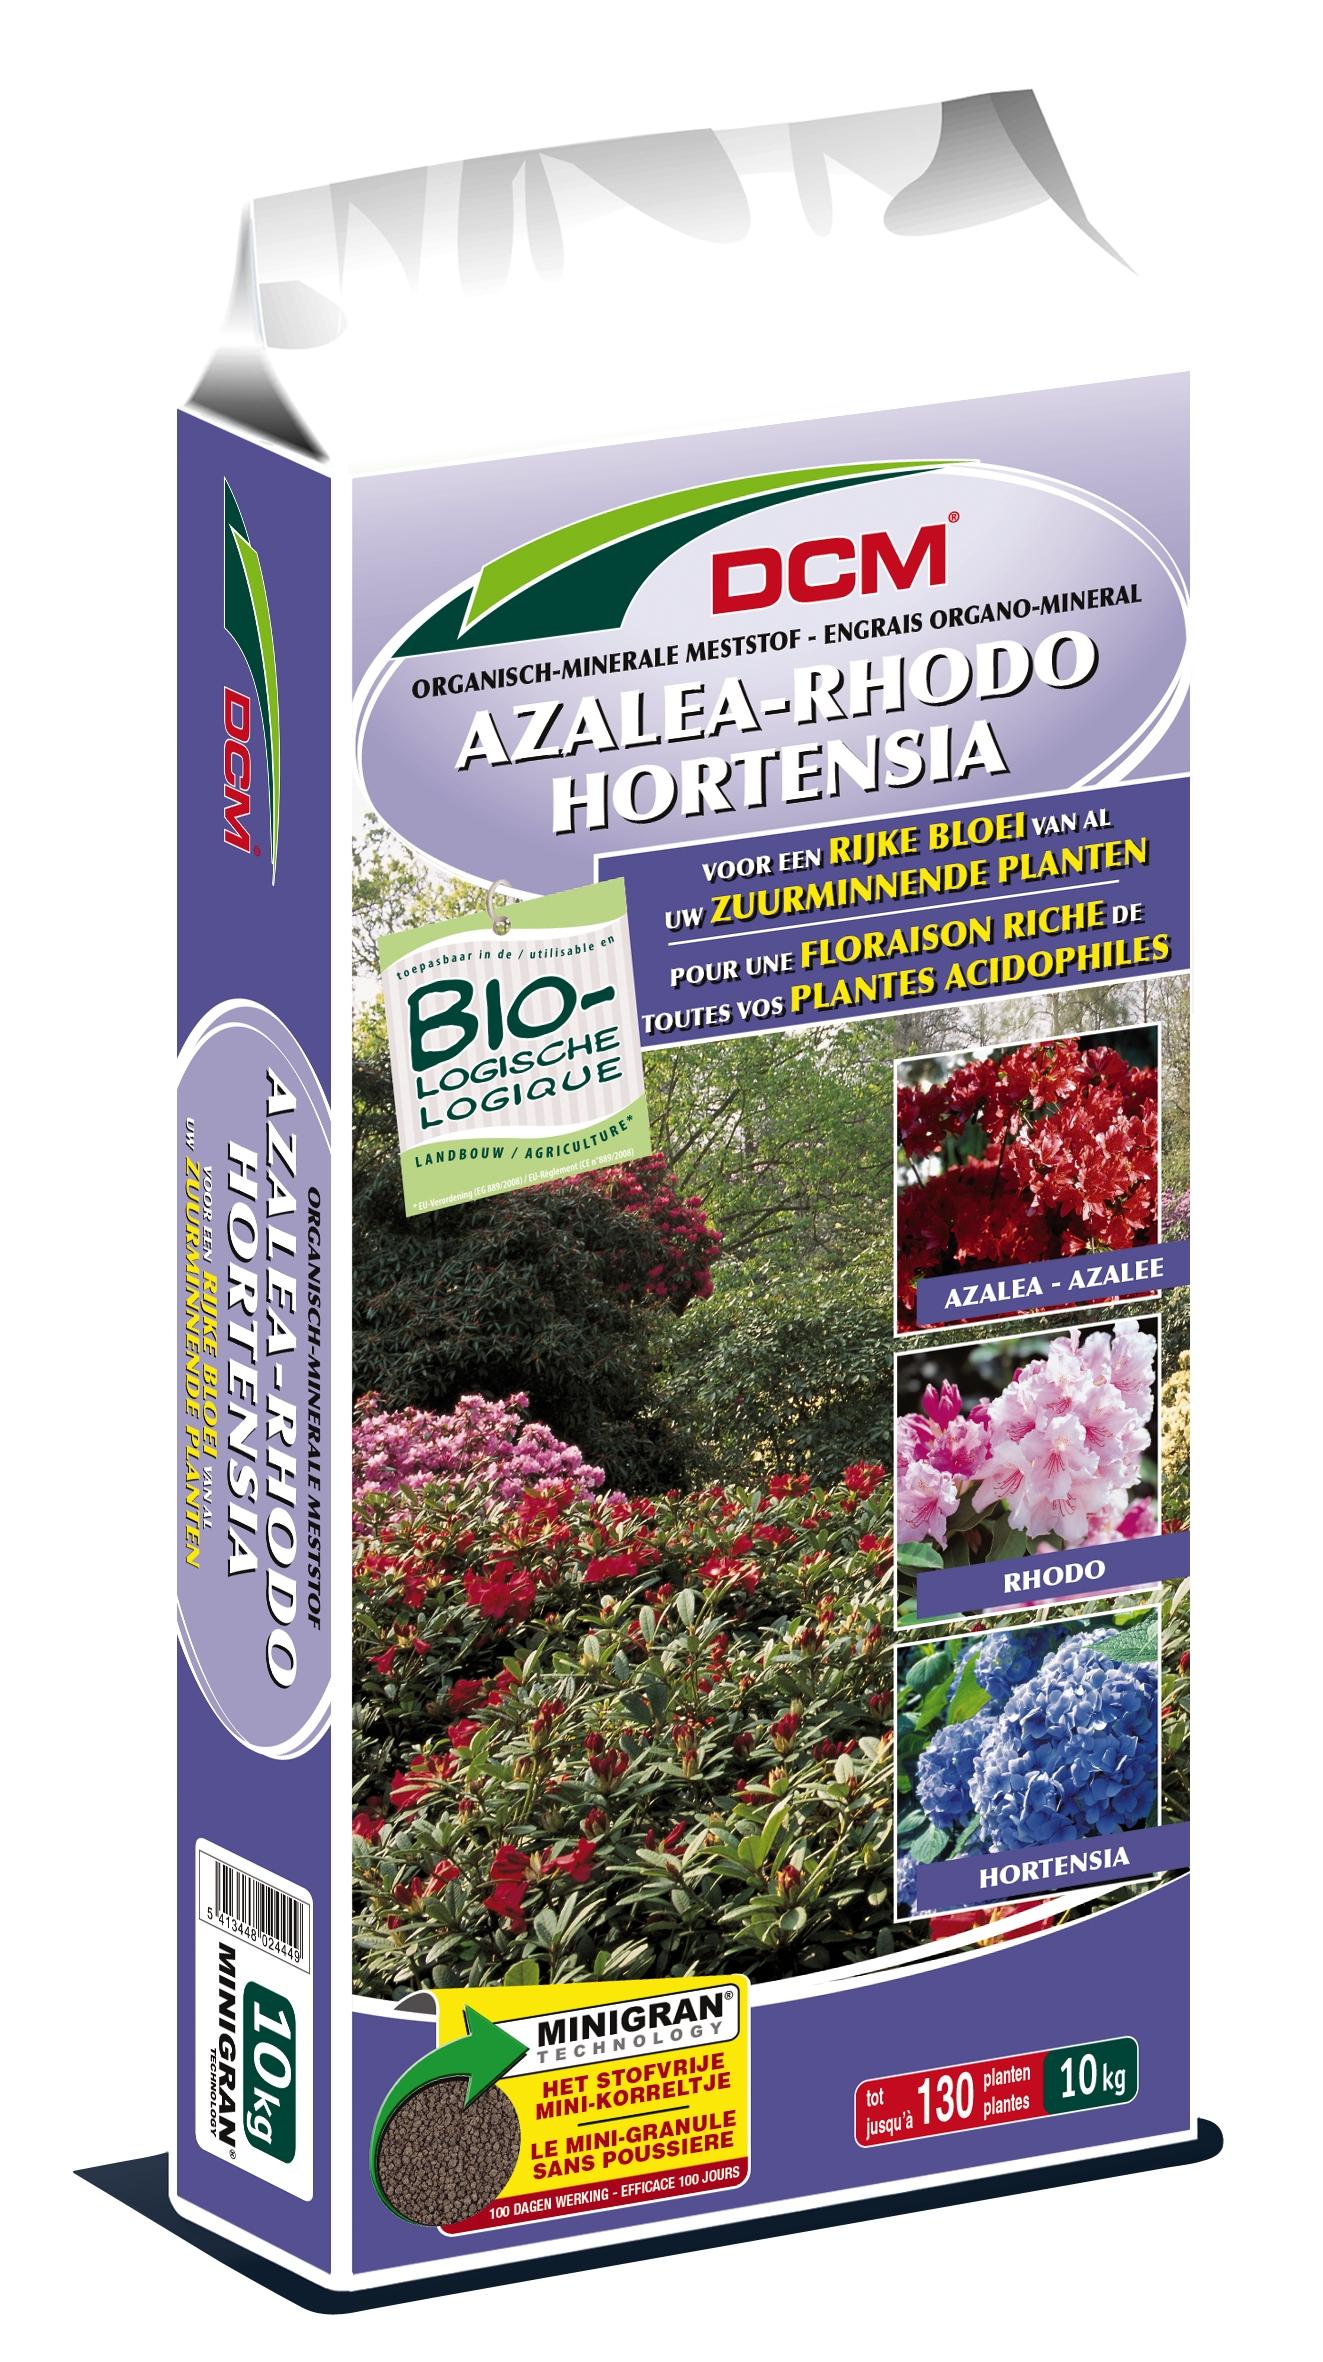 Dcm Organisch-Minerale meststof Rhodo, Hortensia & Azalea.